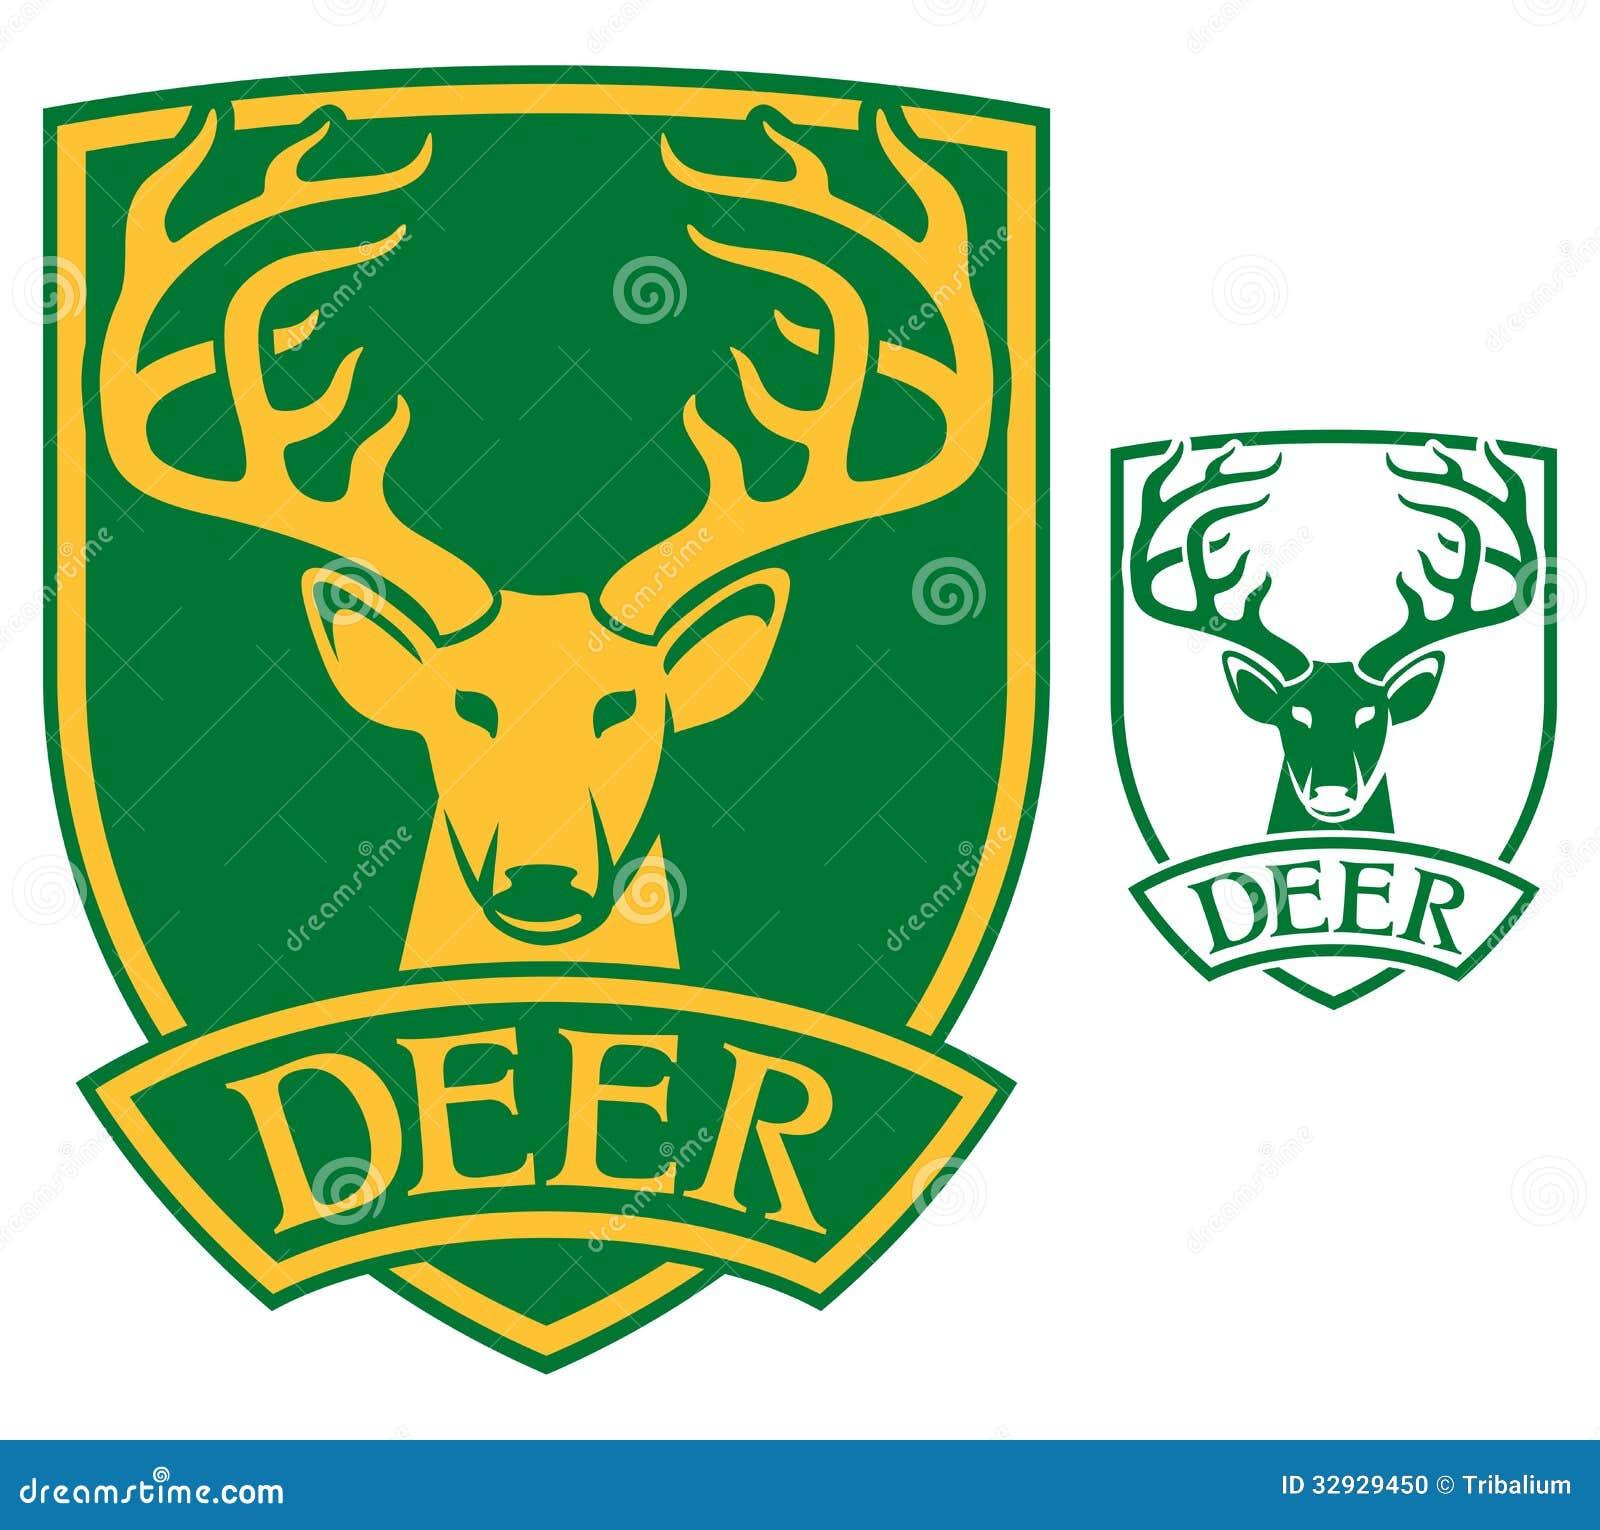 Deer head symbol stock vector illustration of design 32929450 deer head symbol buycottarizona Image collections